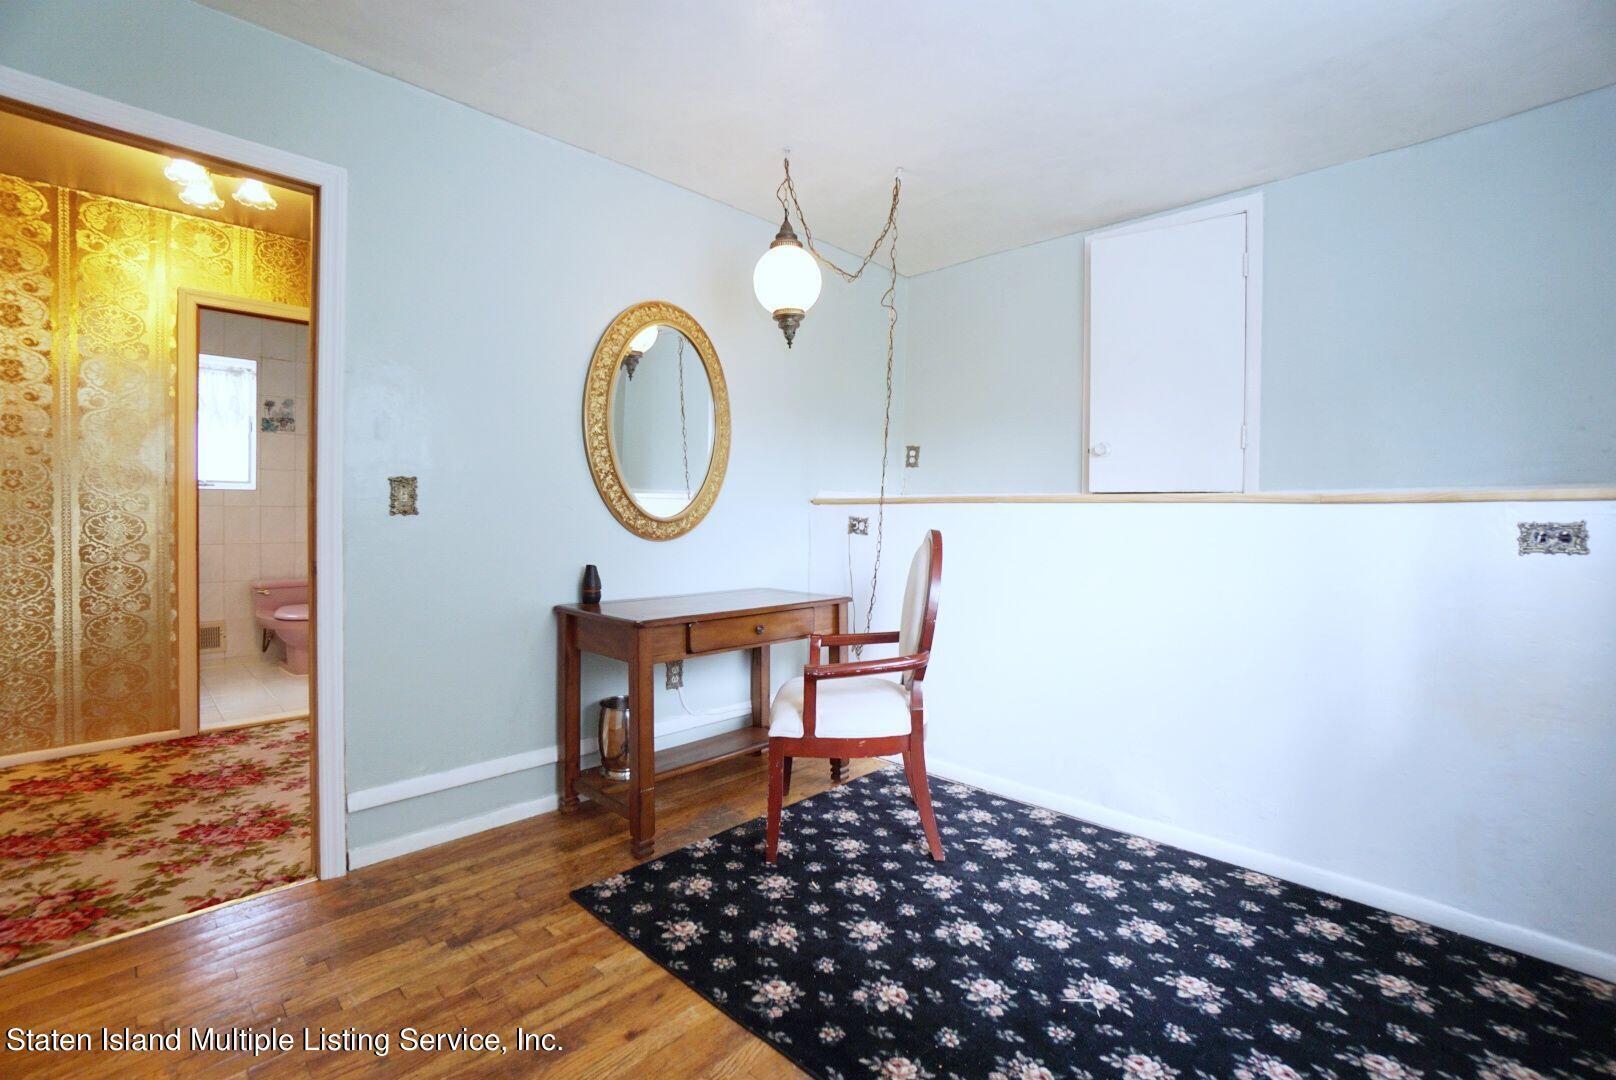 Single Family - Detached 94 Cranford Avenue  Staten Island, NY 10306, MLS-1146620-25